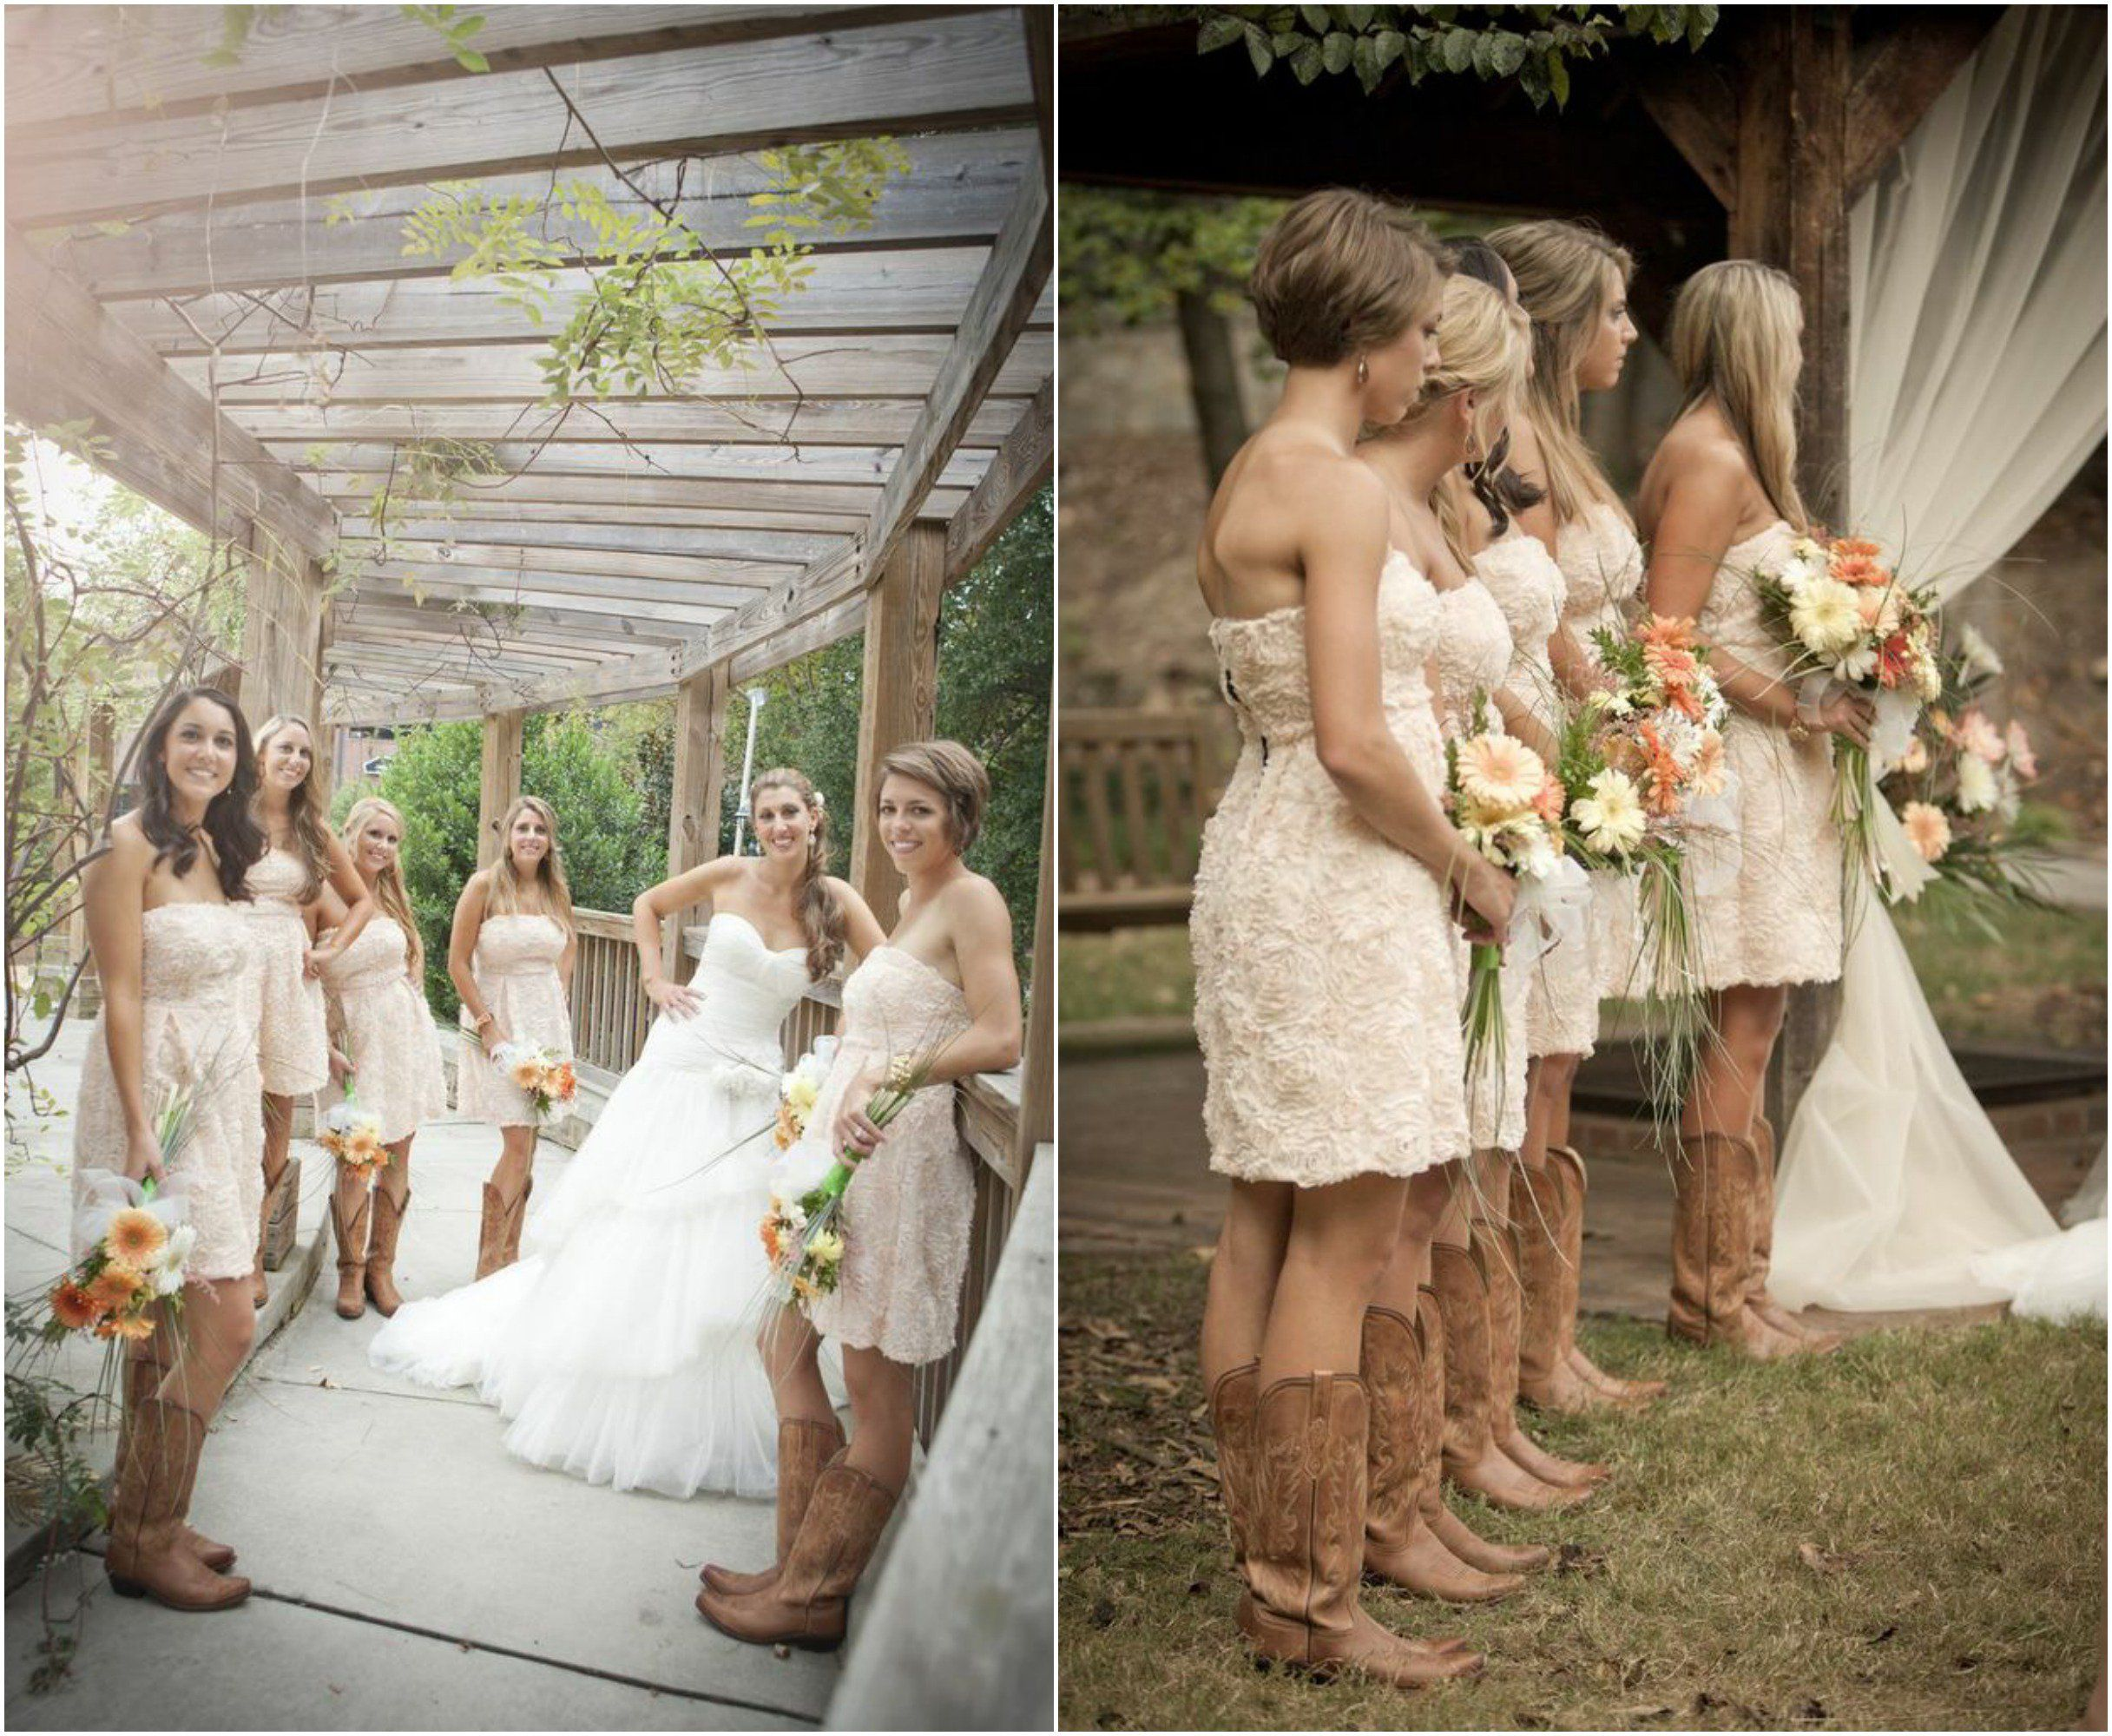 Rustic Wedding With Bridesmaids In Cowboy Boots   Weddings, Wedding ...